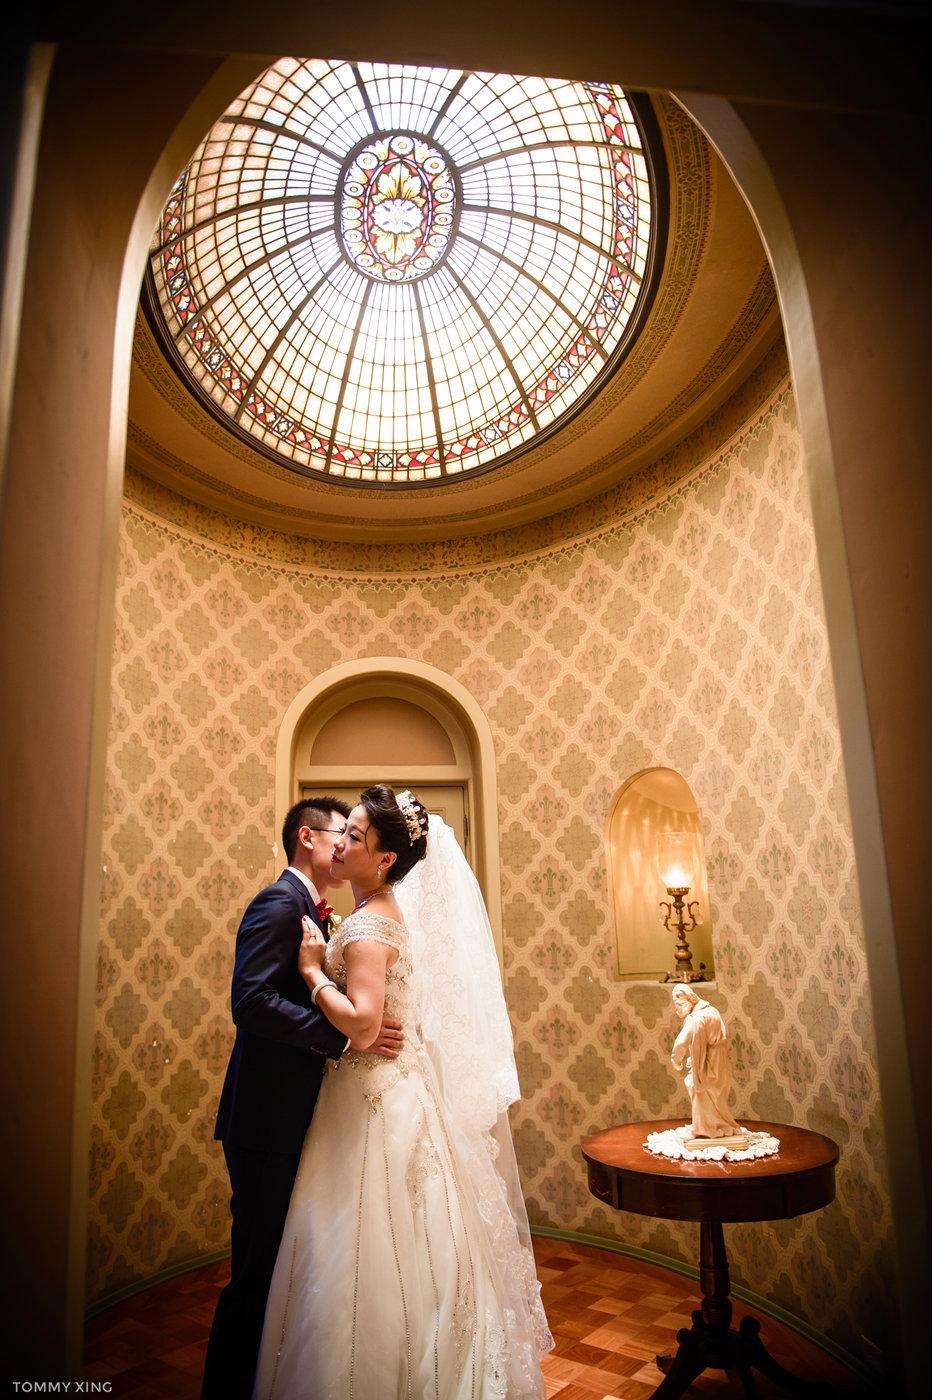 Neighborhood Church Wedding Ranho Palos Verdes Los Angeles Tommy Xing Photography 洛杉矶旧金山婚礼婚纱照摄影师 030.jpg